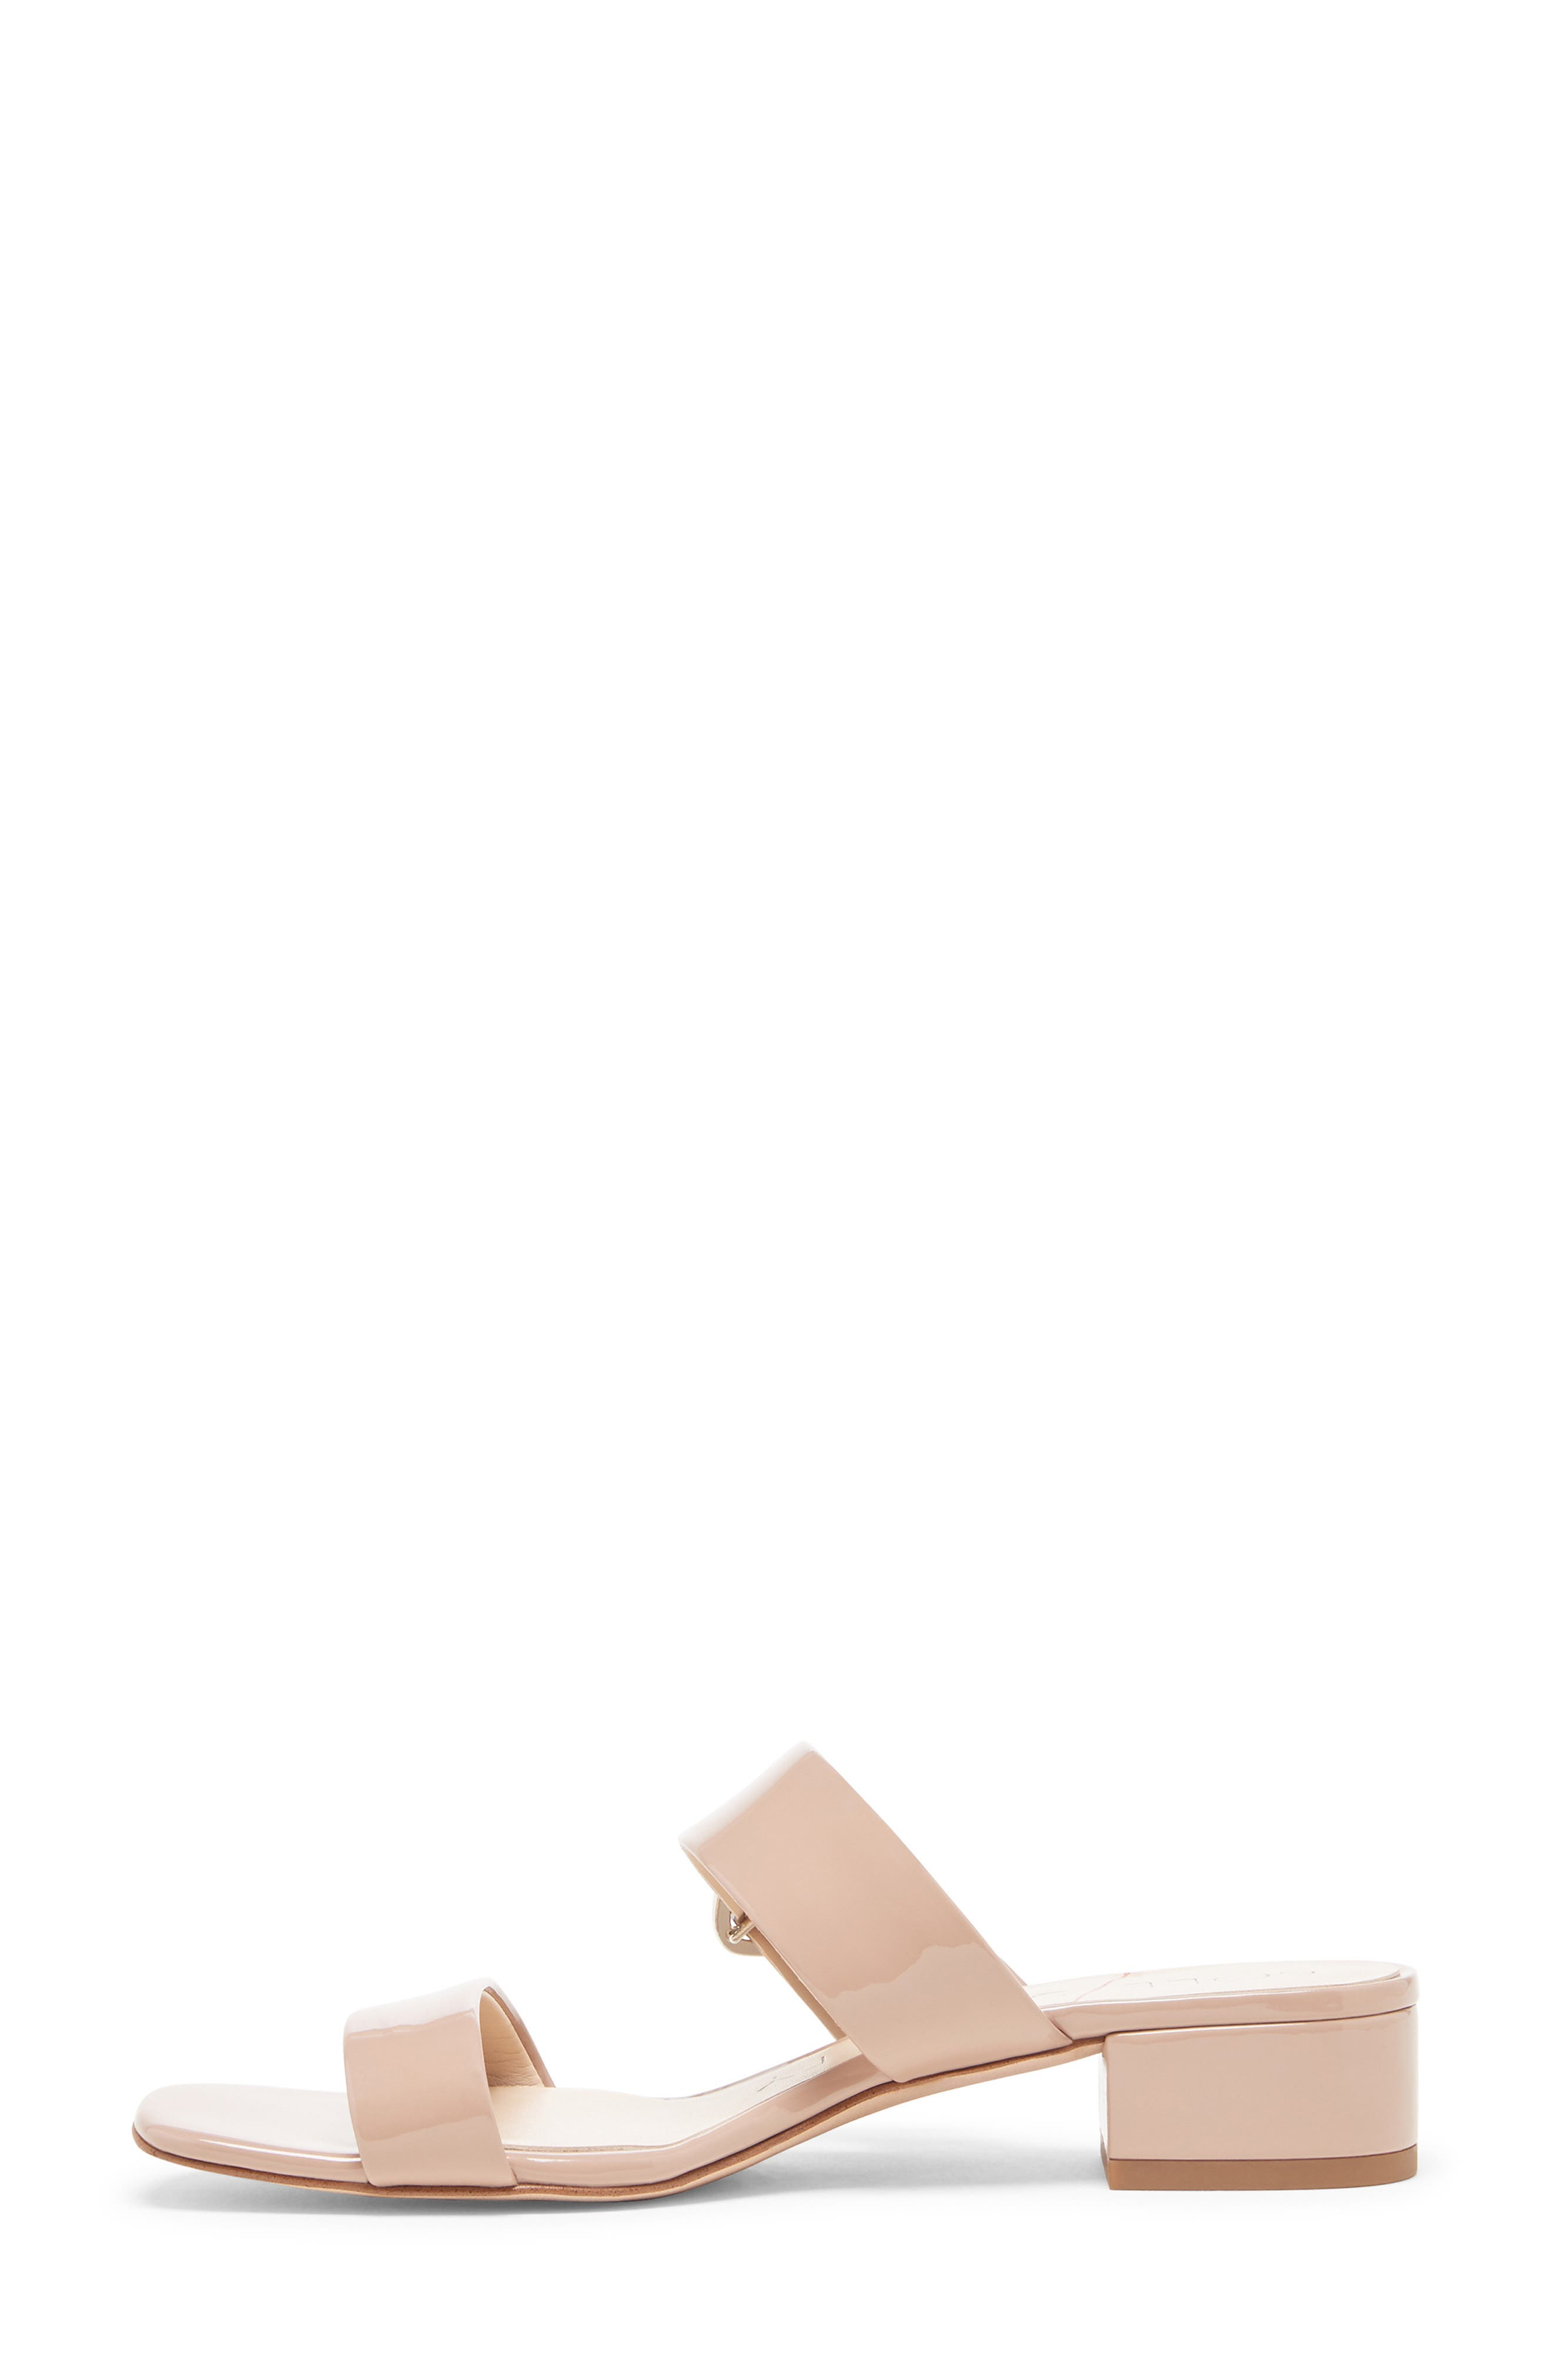 ,                             Emberlise Slide Sandal,                             Alternate thumbnail 8, color,                             NUDE FAUX PATENT LEATHER